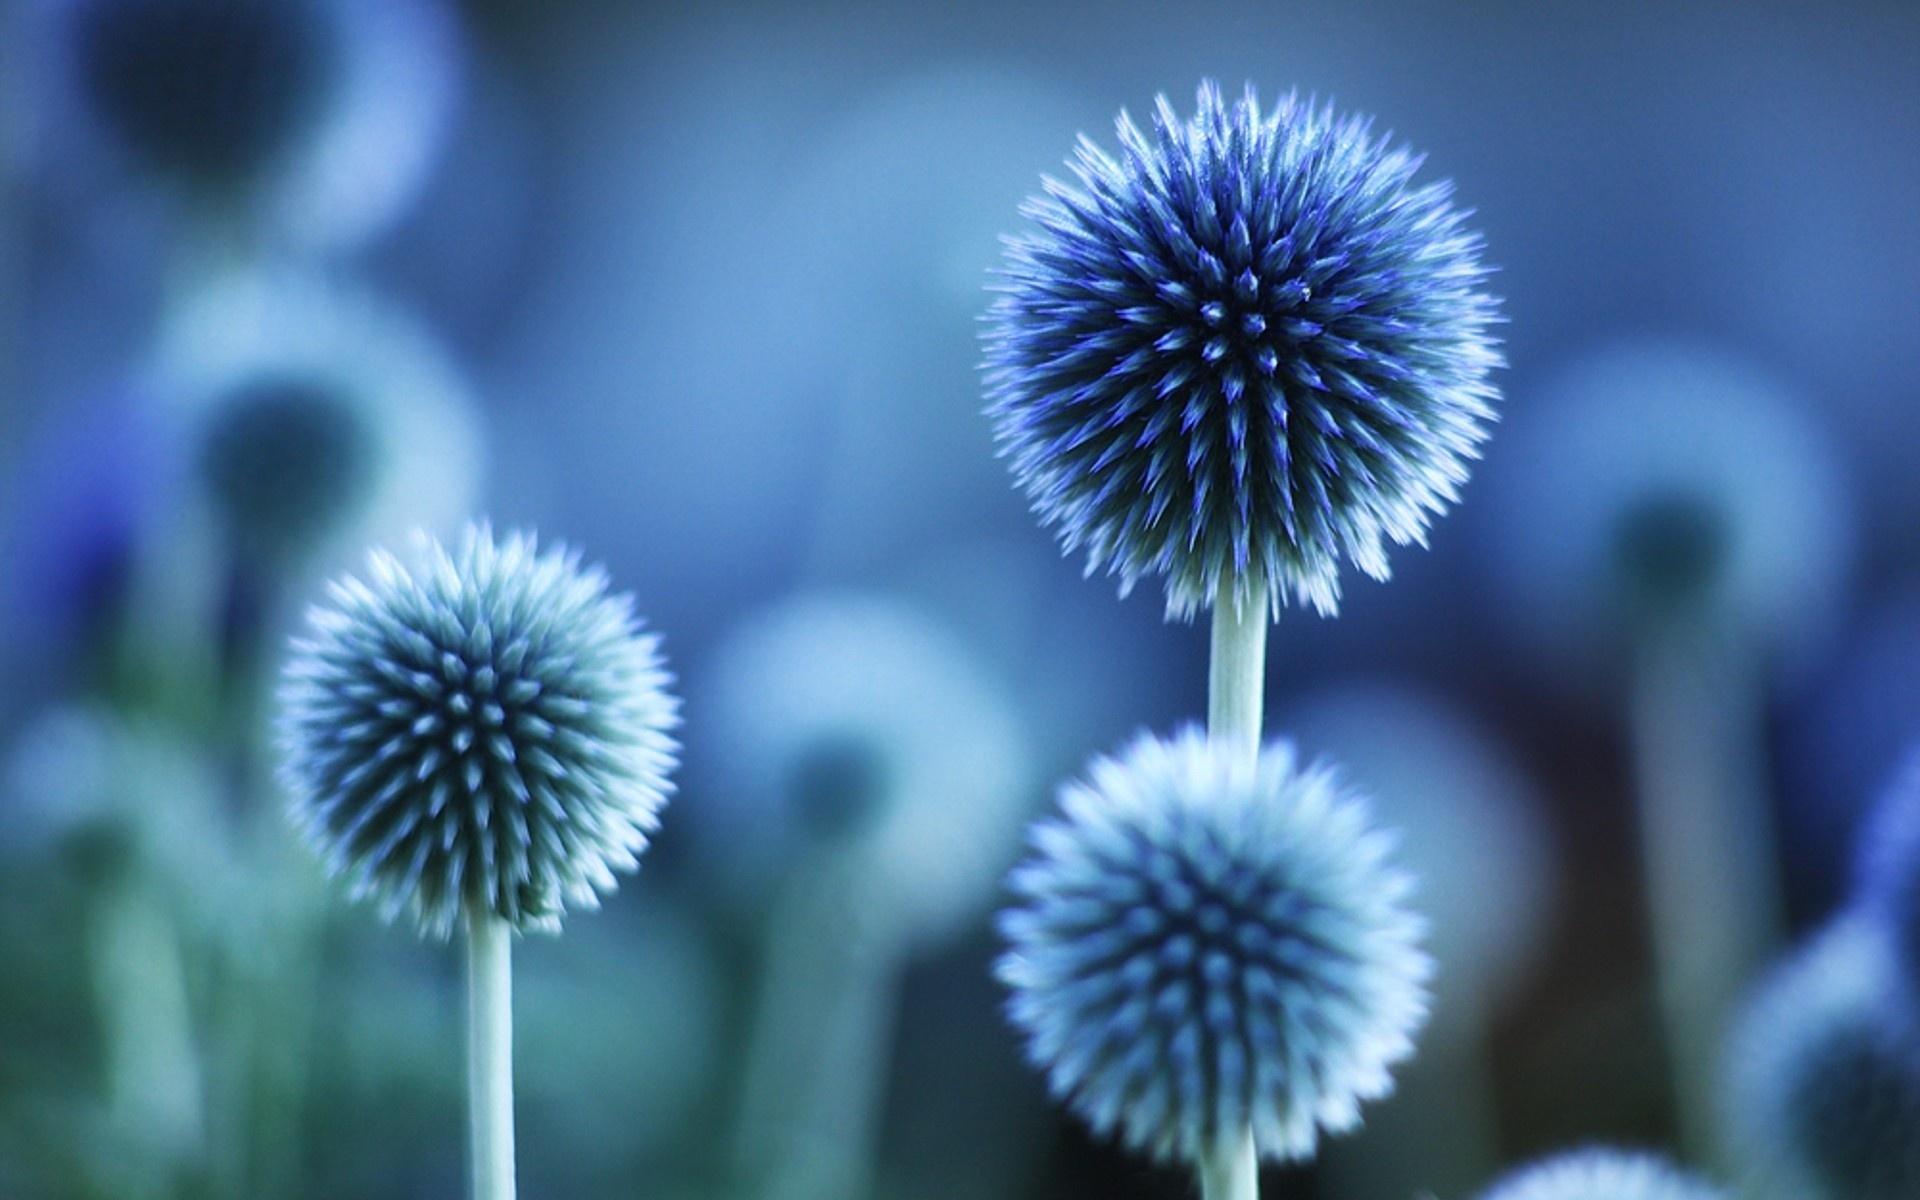 Blue Flower Wallpaper WallpaperSafari